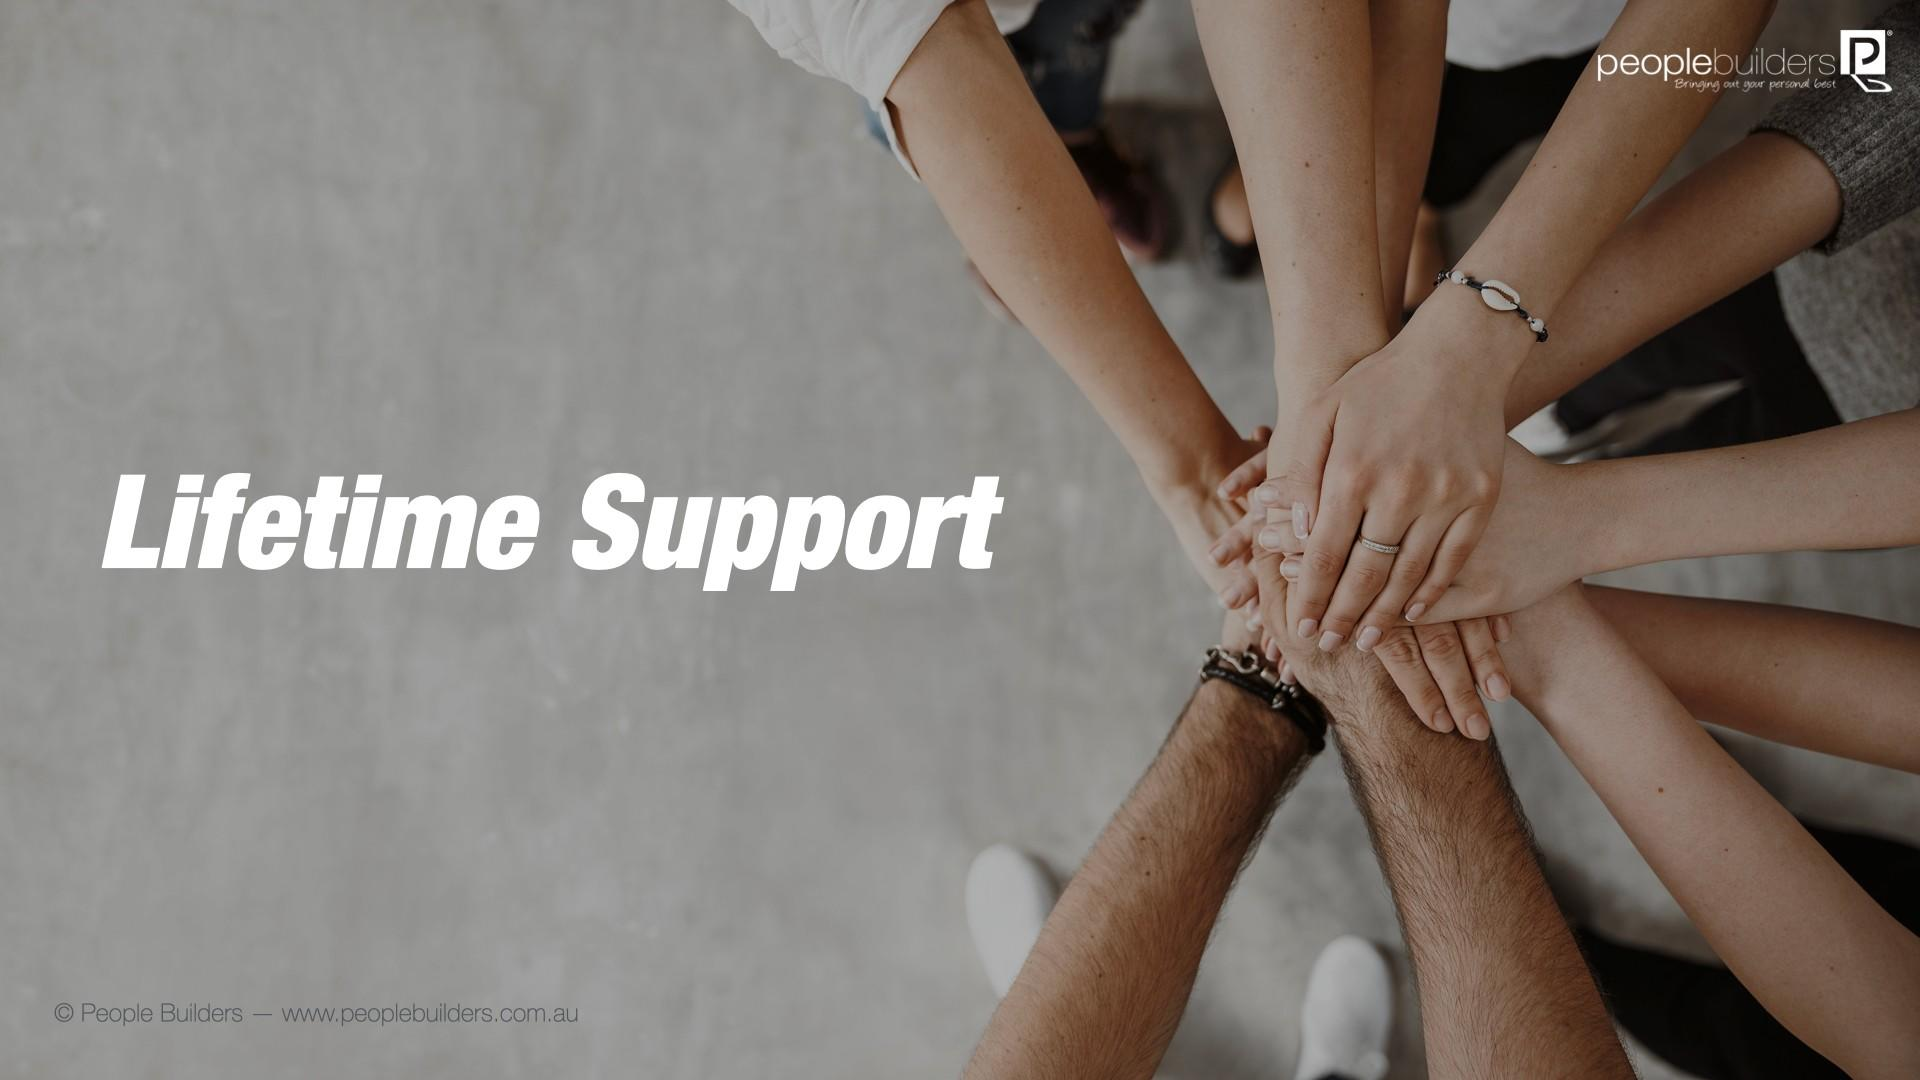 Lifetime Support poster Image showing hands joined together depicting teamwork.